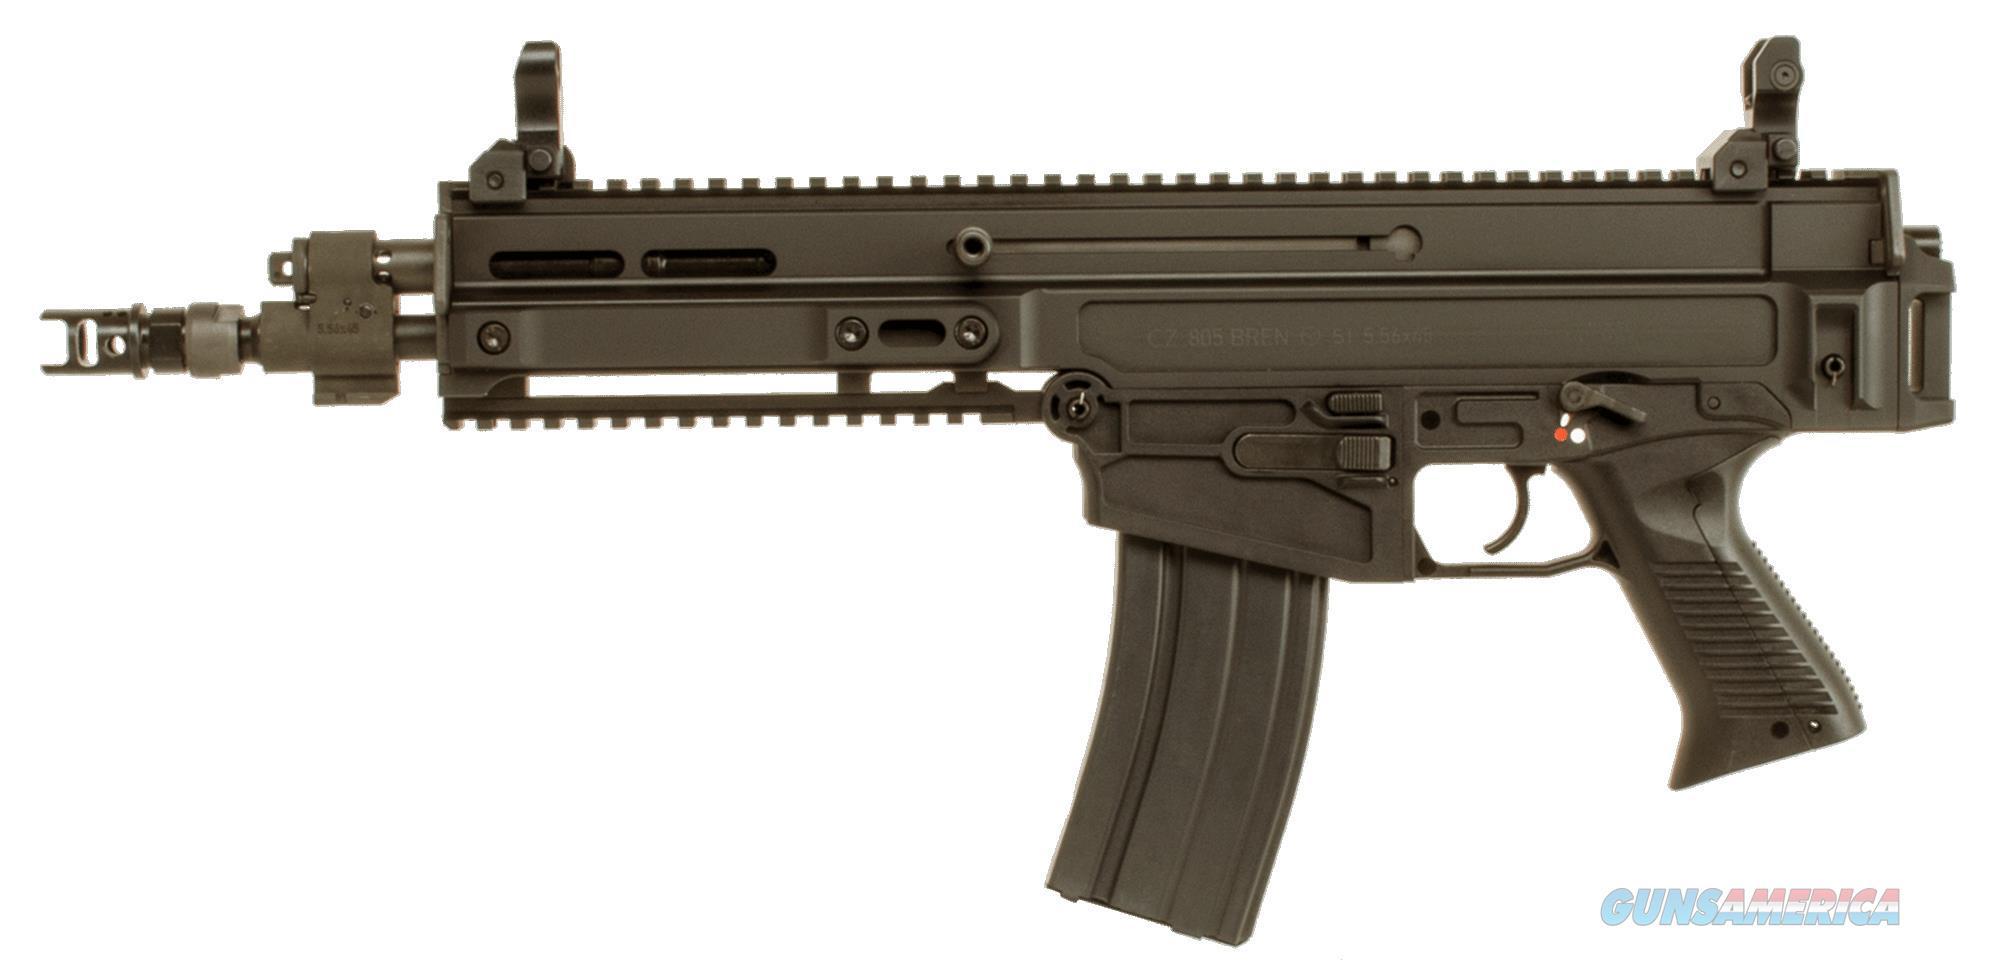 "Czusa 91362 Czusa 805 Bren Ar Pistol Semi-Automatic 223 Remington/5.56 Nato 11"" 30+1 Flat Dark Earth Finish 91362  Guns > Pistols > C Misc Pistols"